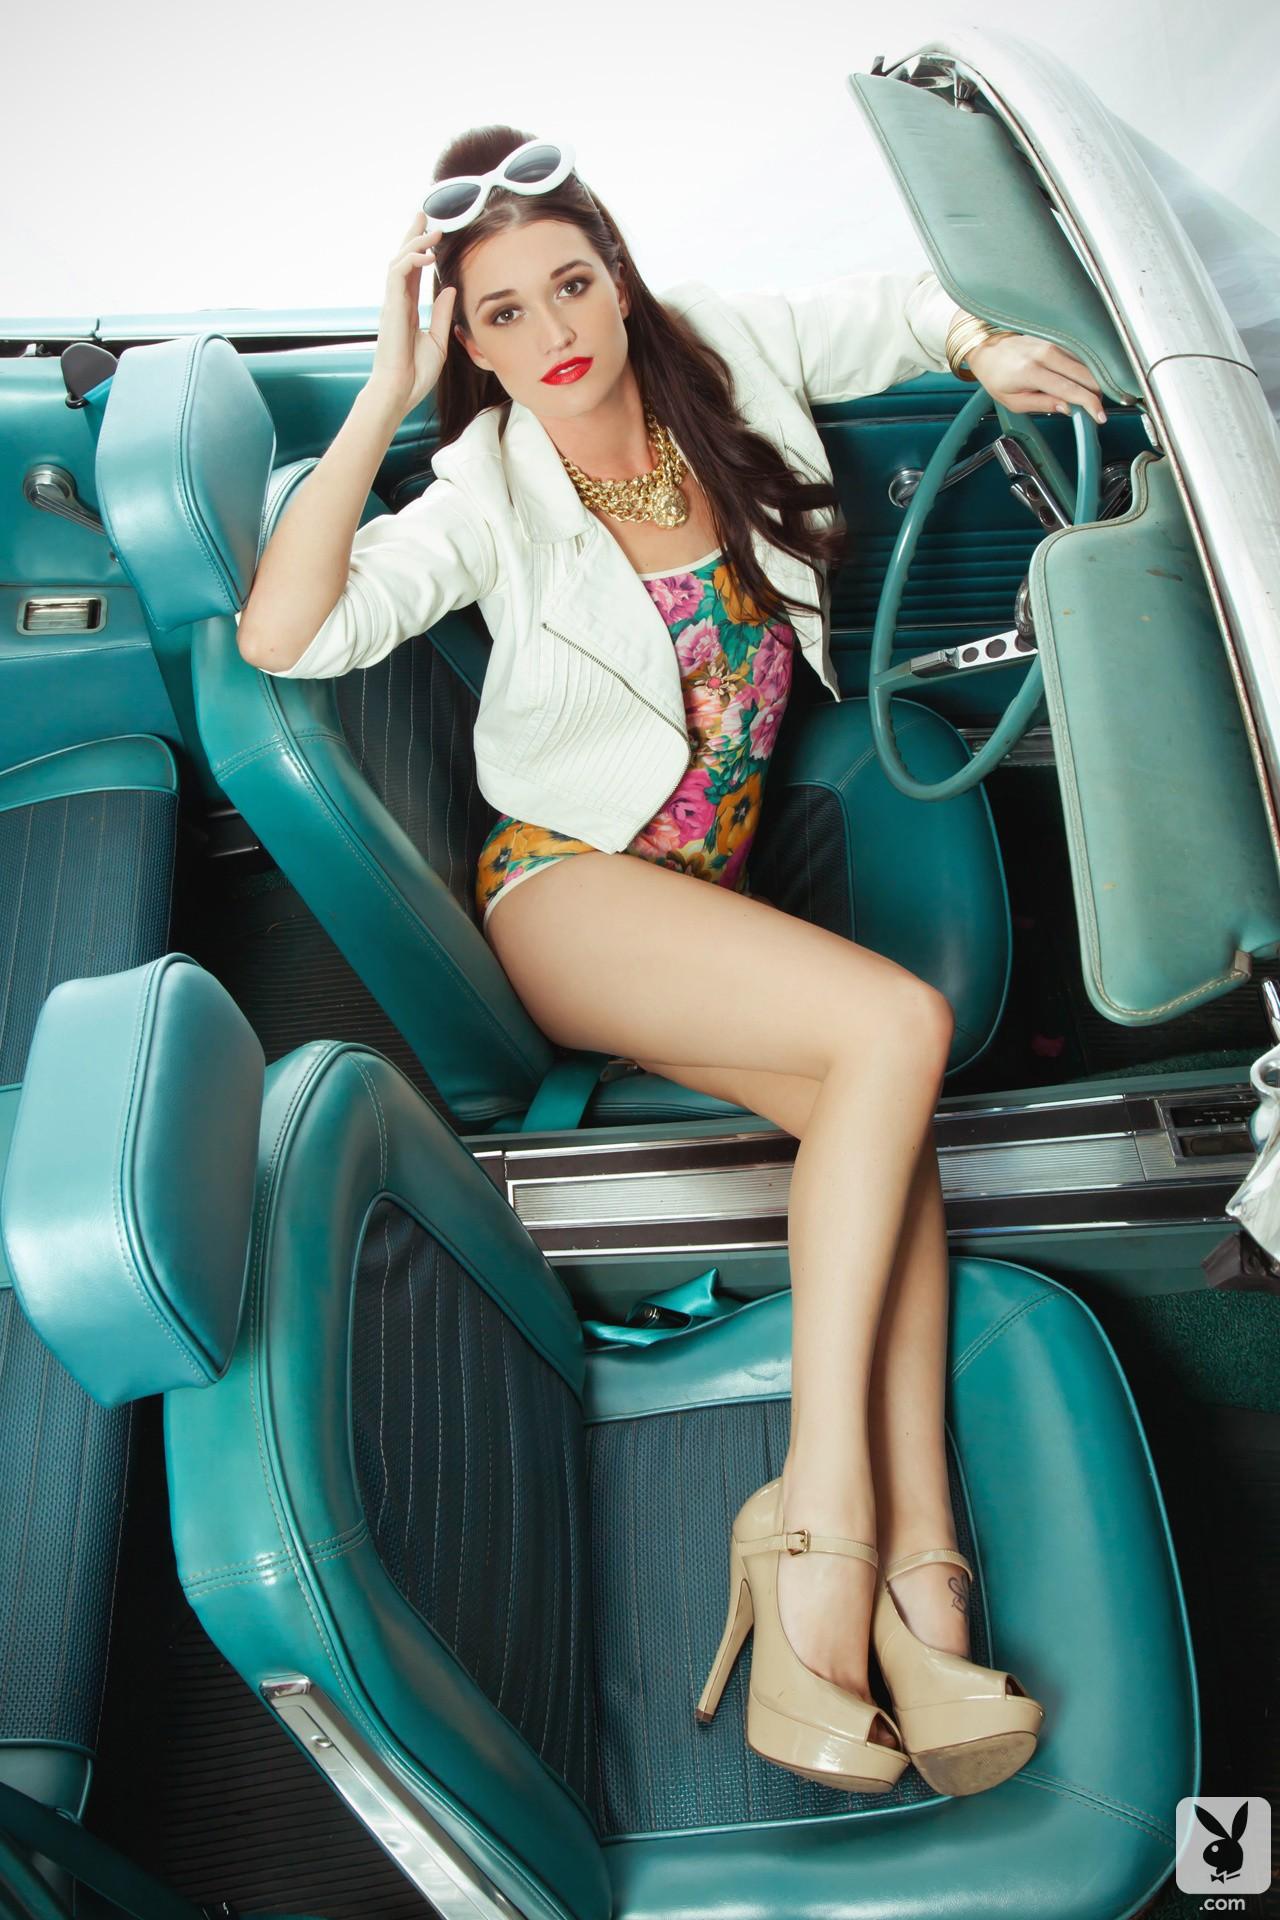 Jade Roper Does Retro Playboy Photo Shoot in Classic ...